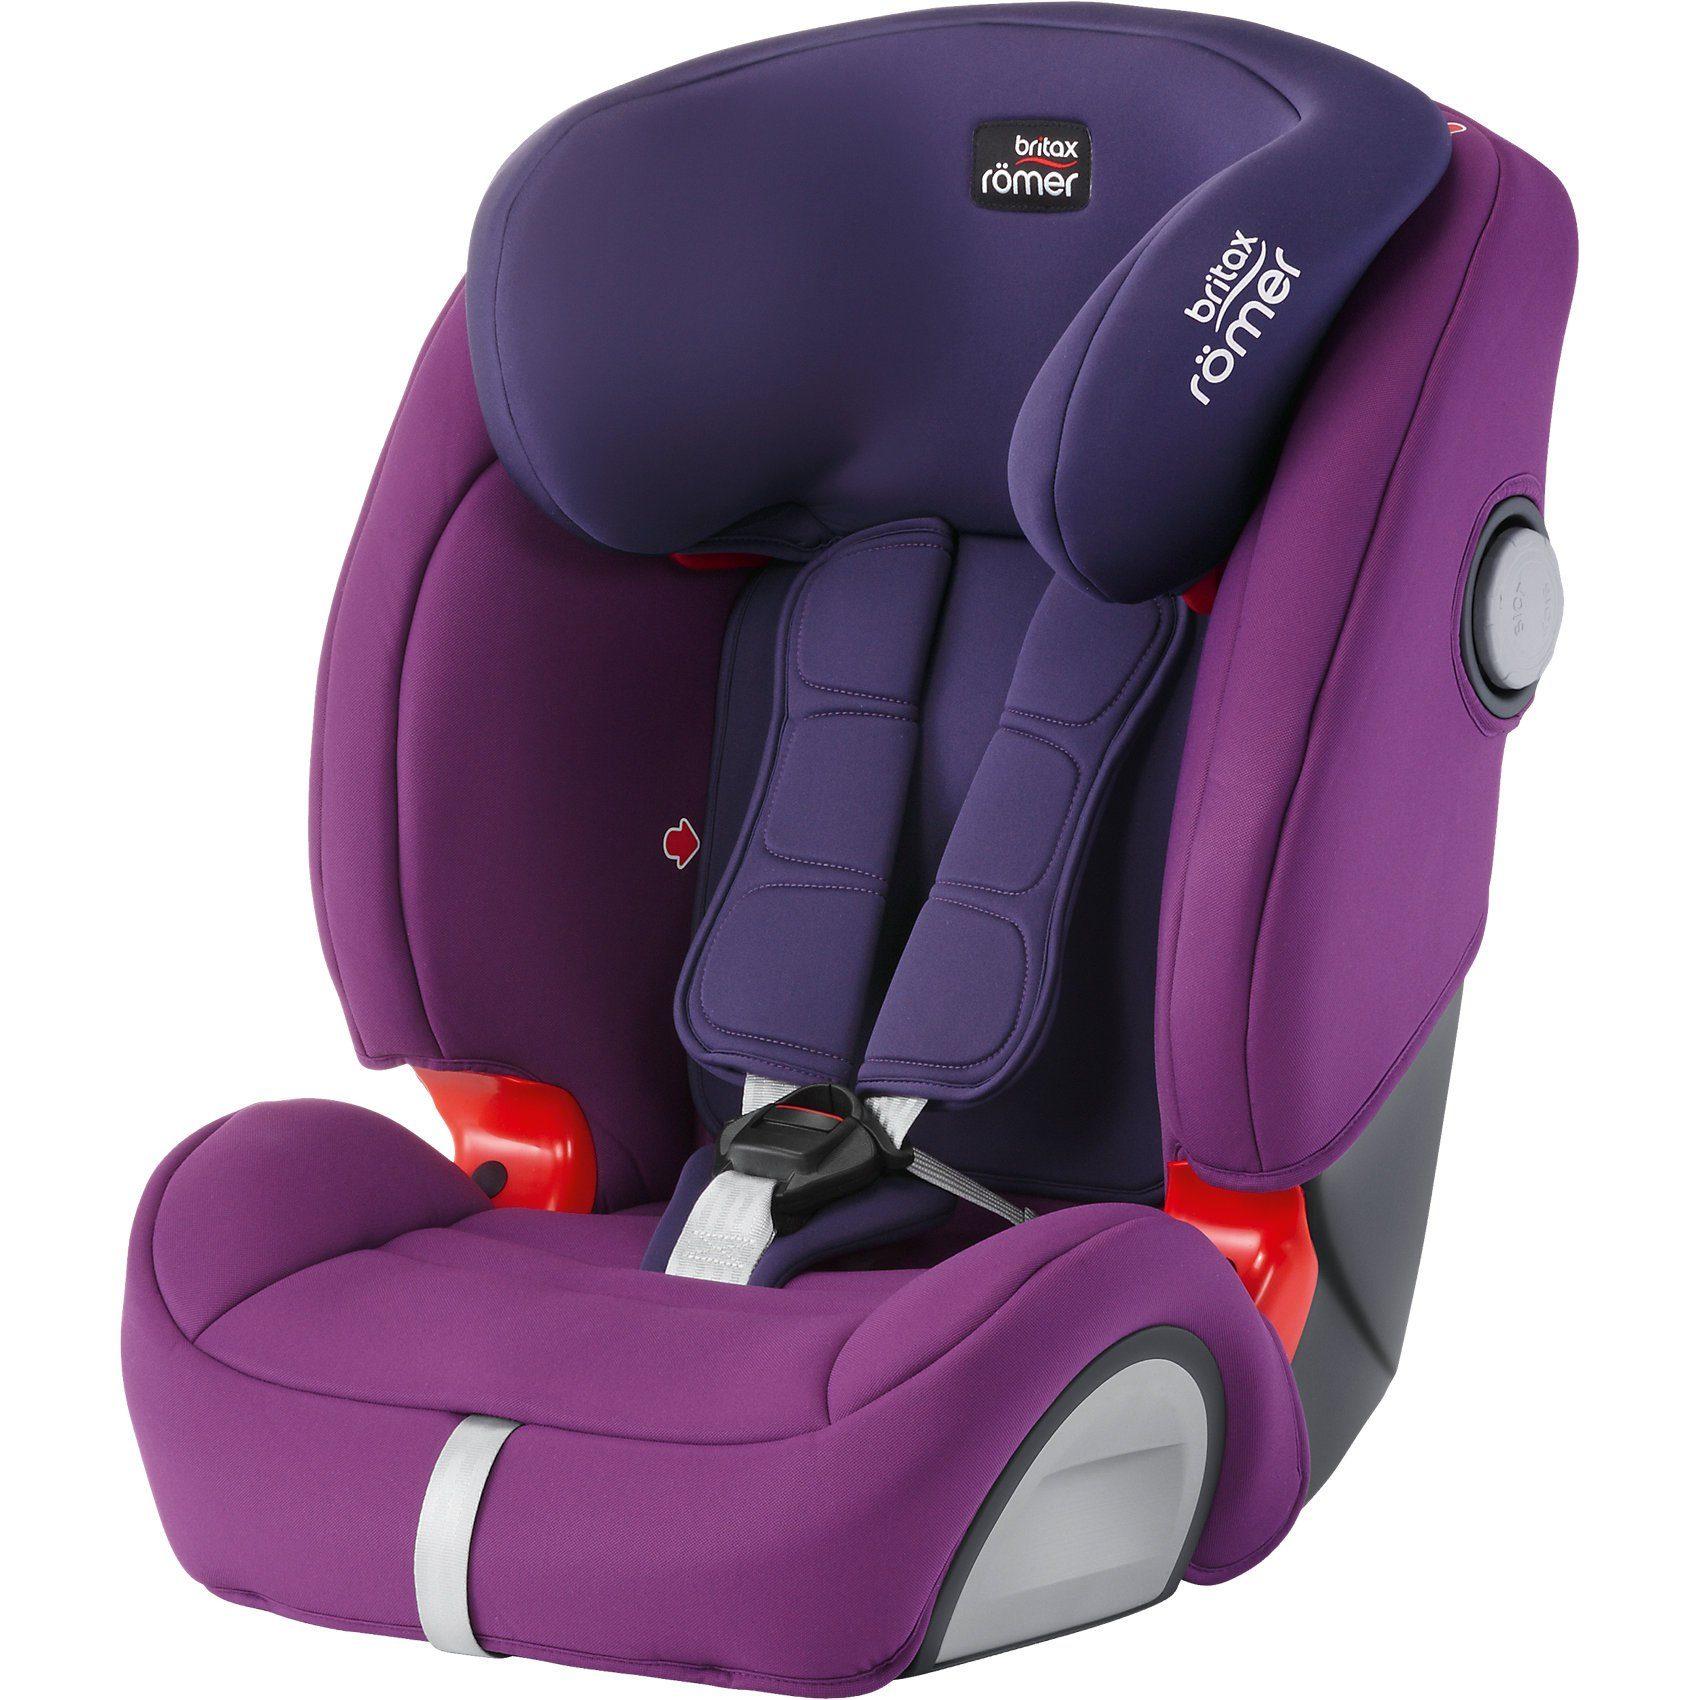 BRITAX RÖMER Auto-Kindersitz Evolva 1-2-3 SL SICT, Mineral Purple, 2017